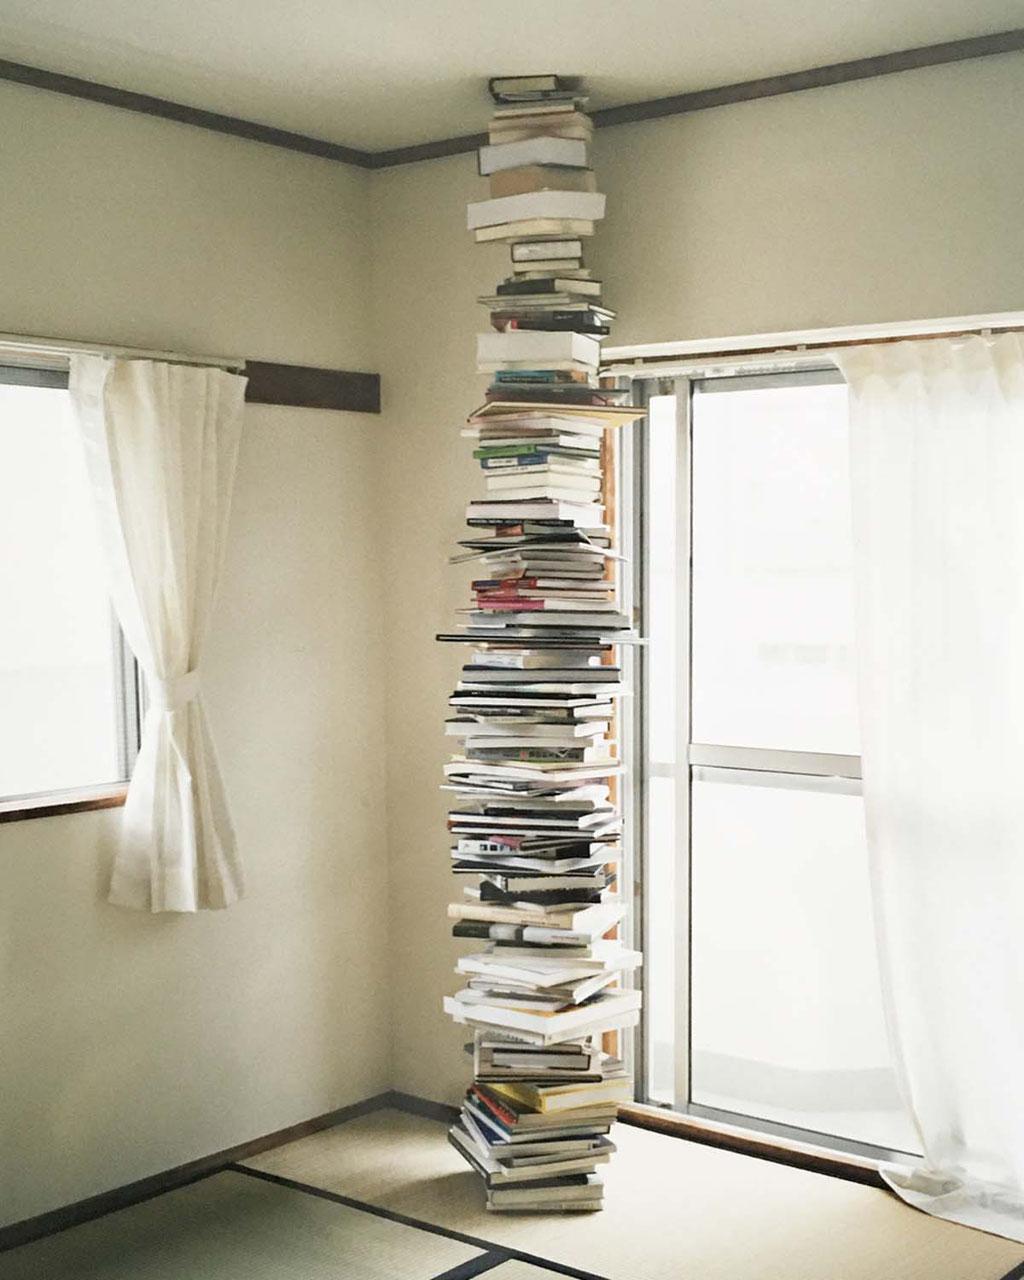 Books / Waterfall・2010-2020・Chromogenic print